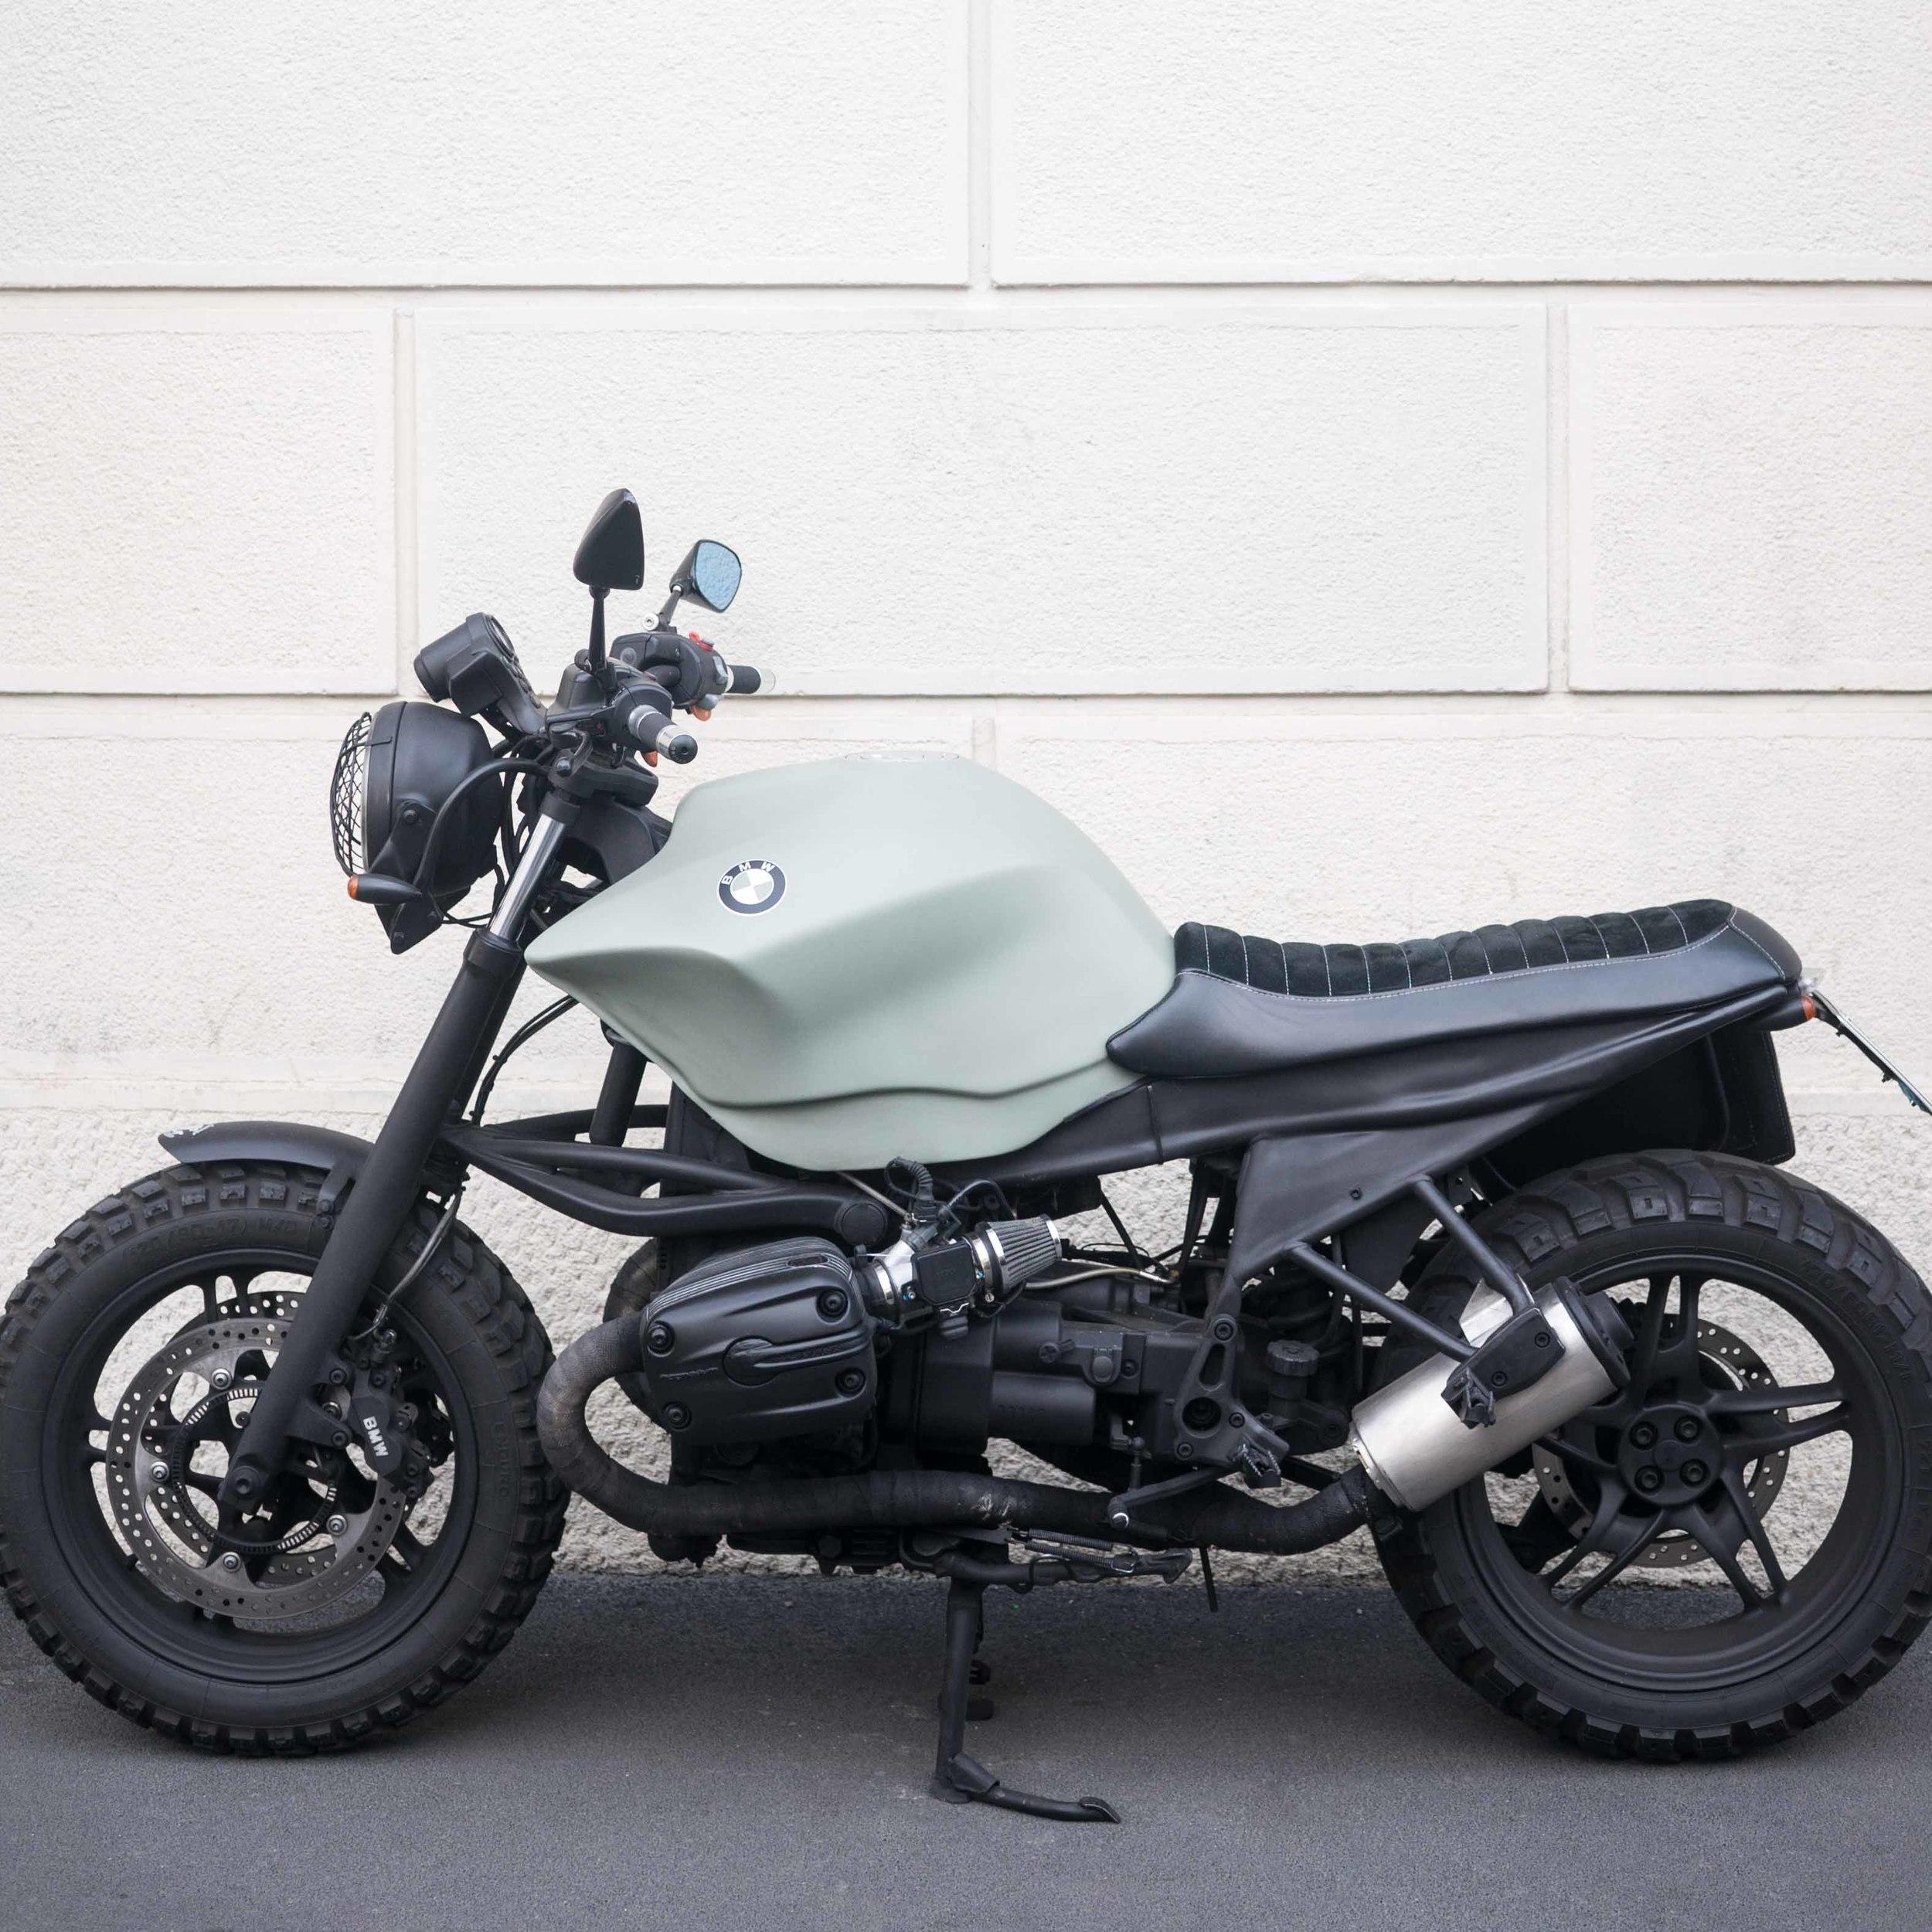 Marca: BMW Modello: R1150 (Special Officine Mermaid)  0 19